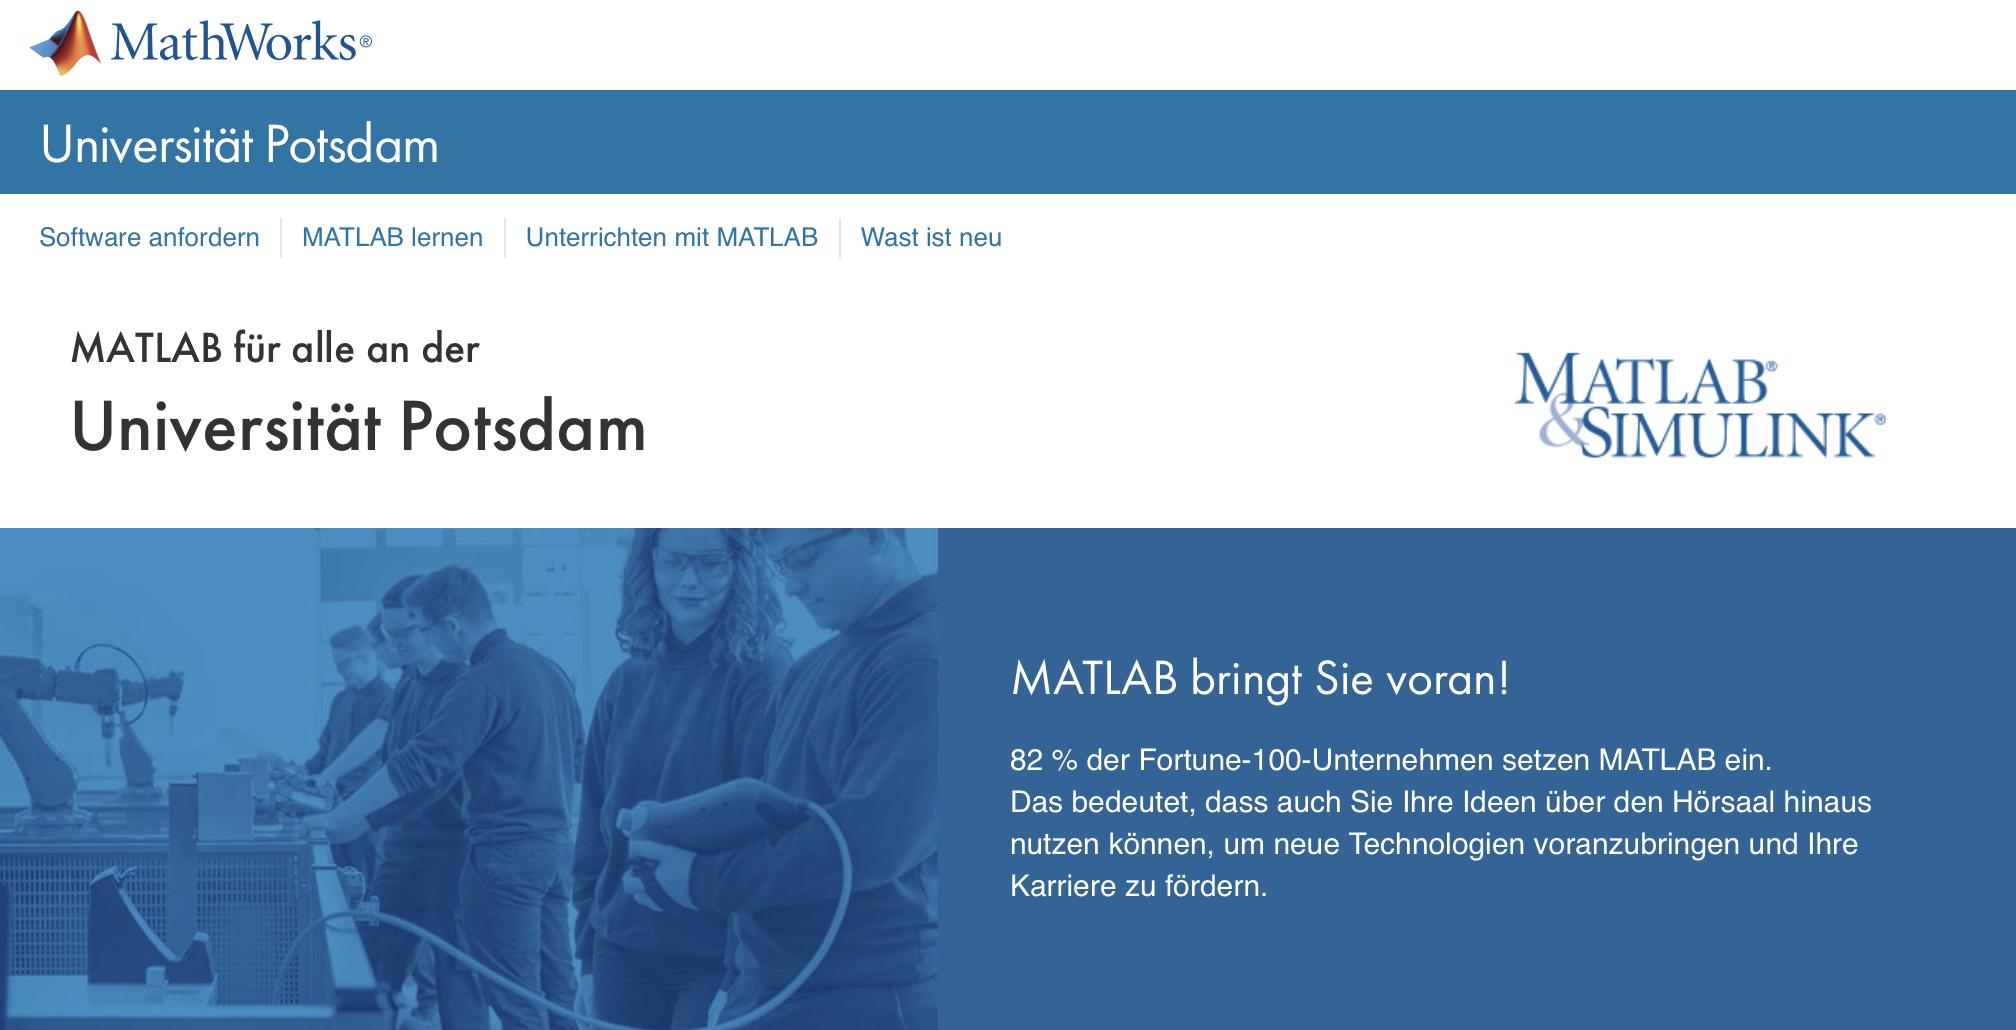 MATLAB/Simulink Total Academic Headcount License at U Potsdam